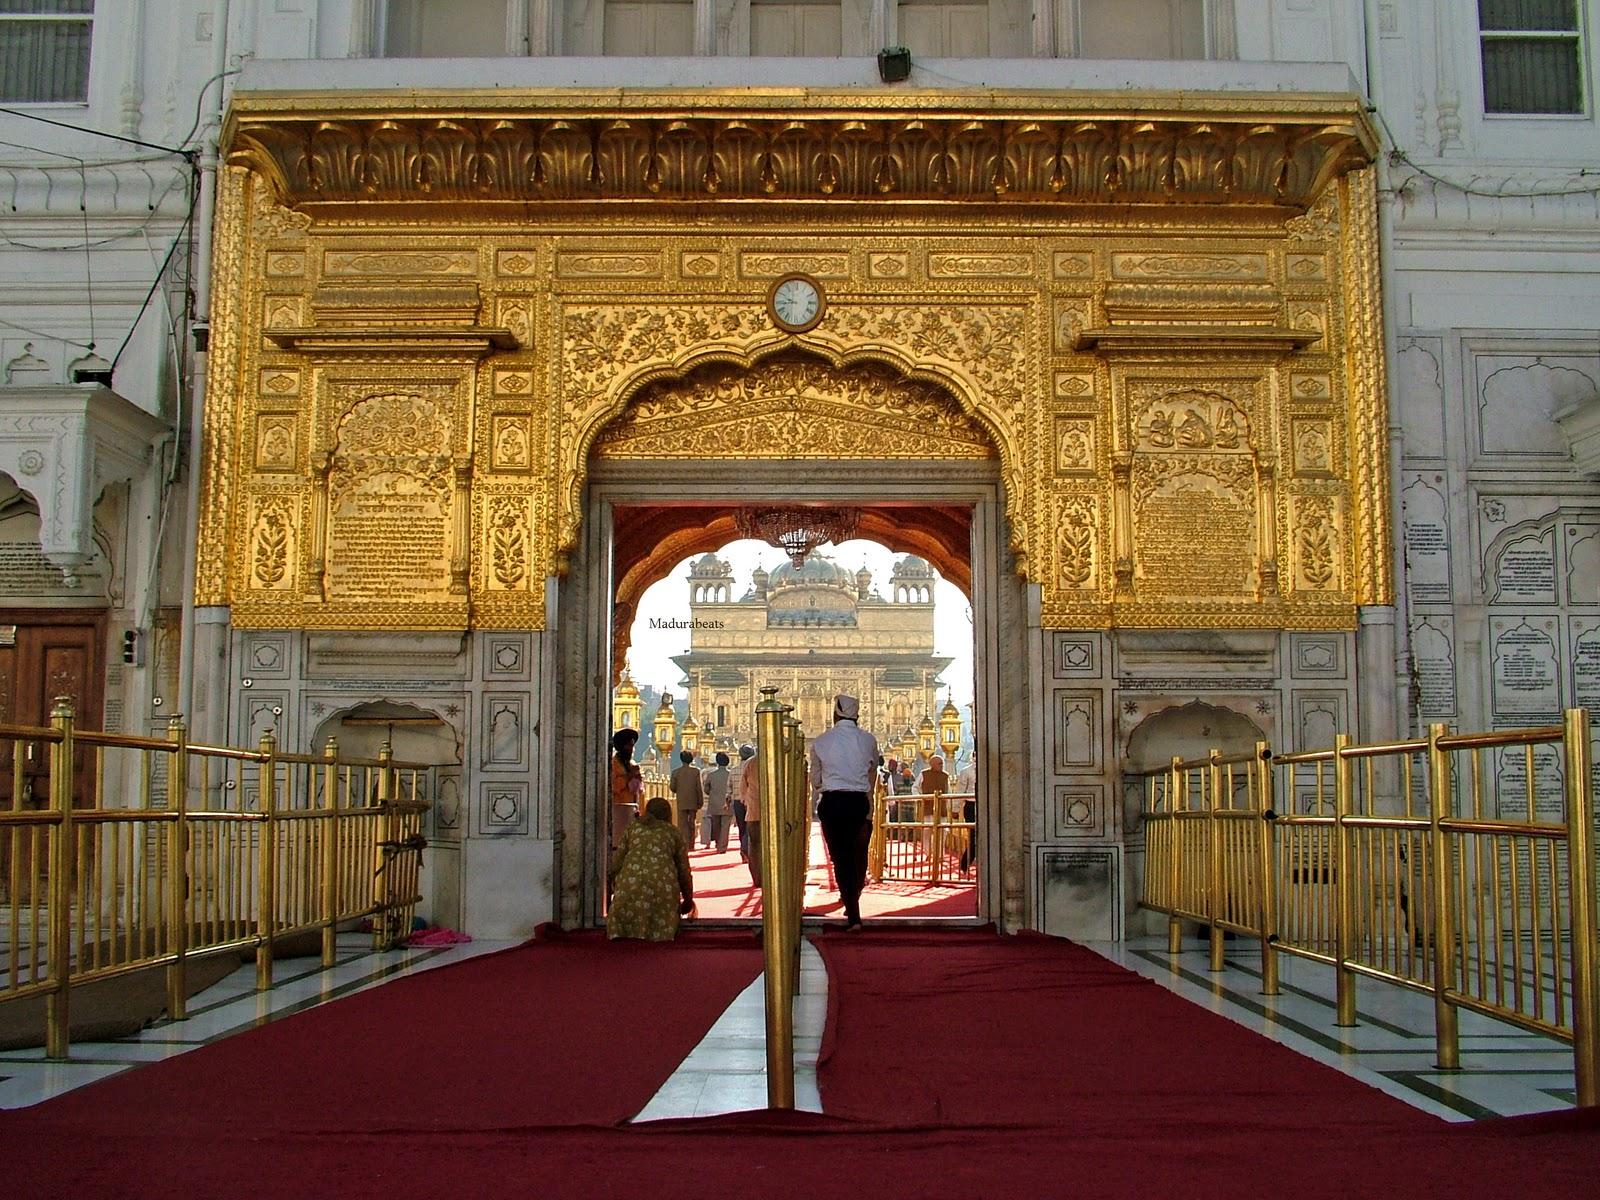 Amritsar Golden Temple entrance